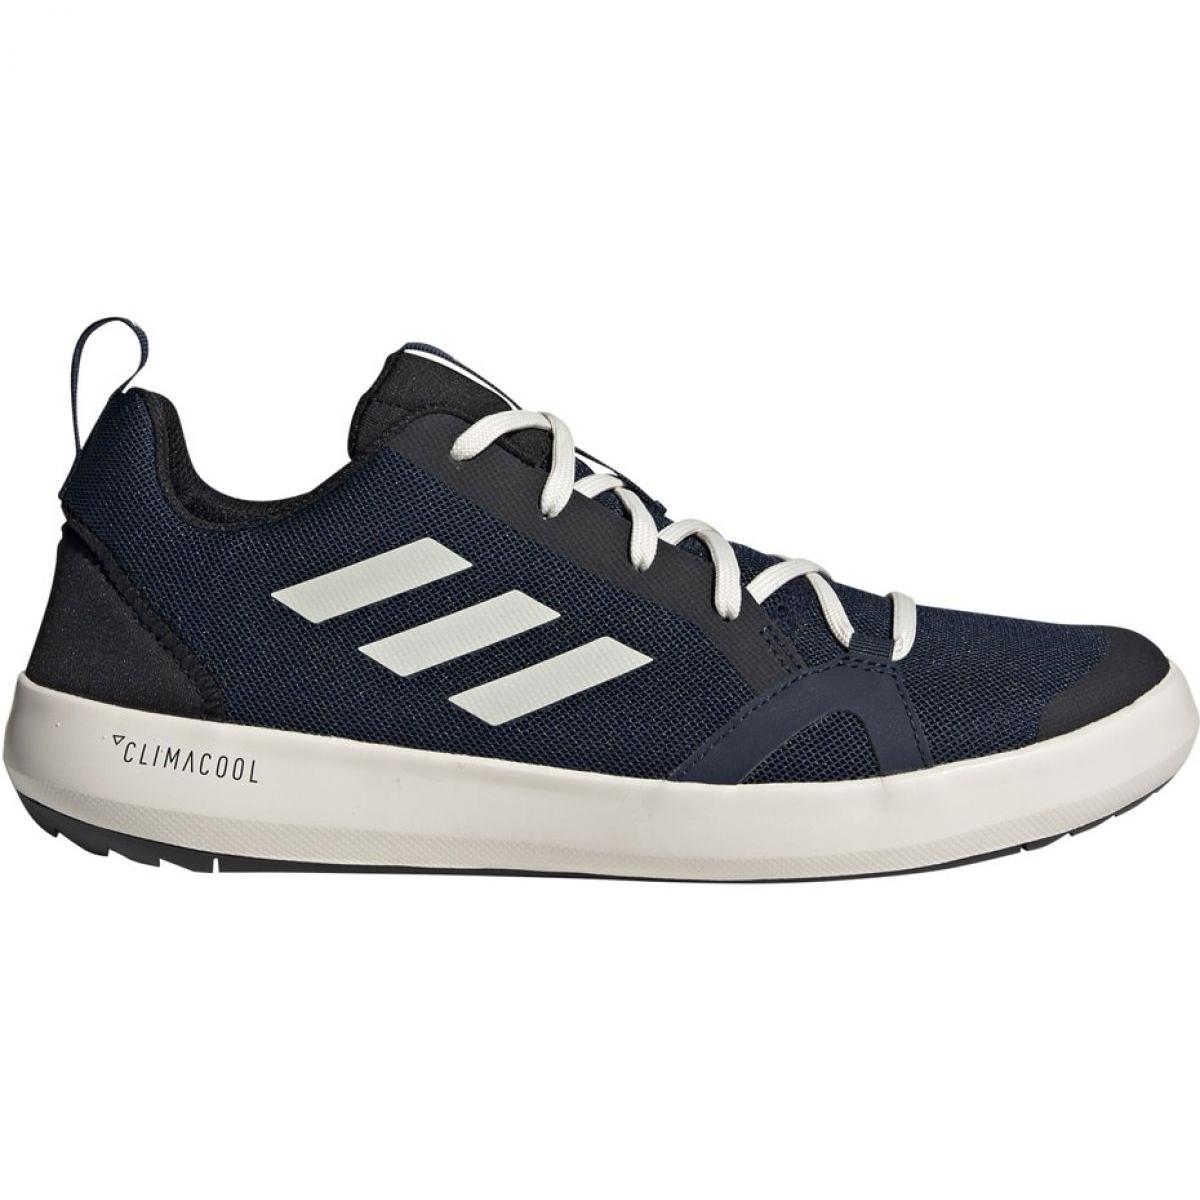 adidas terrex shoes jabong